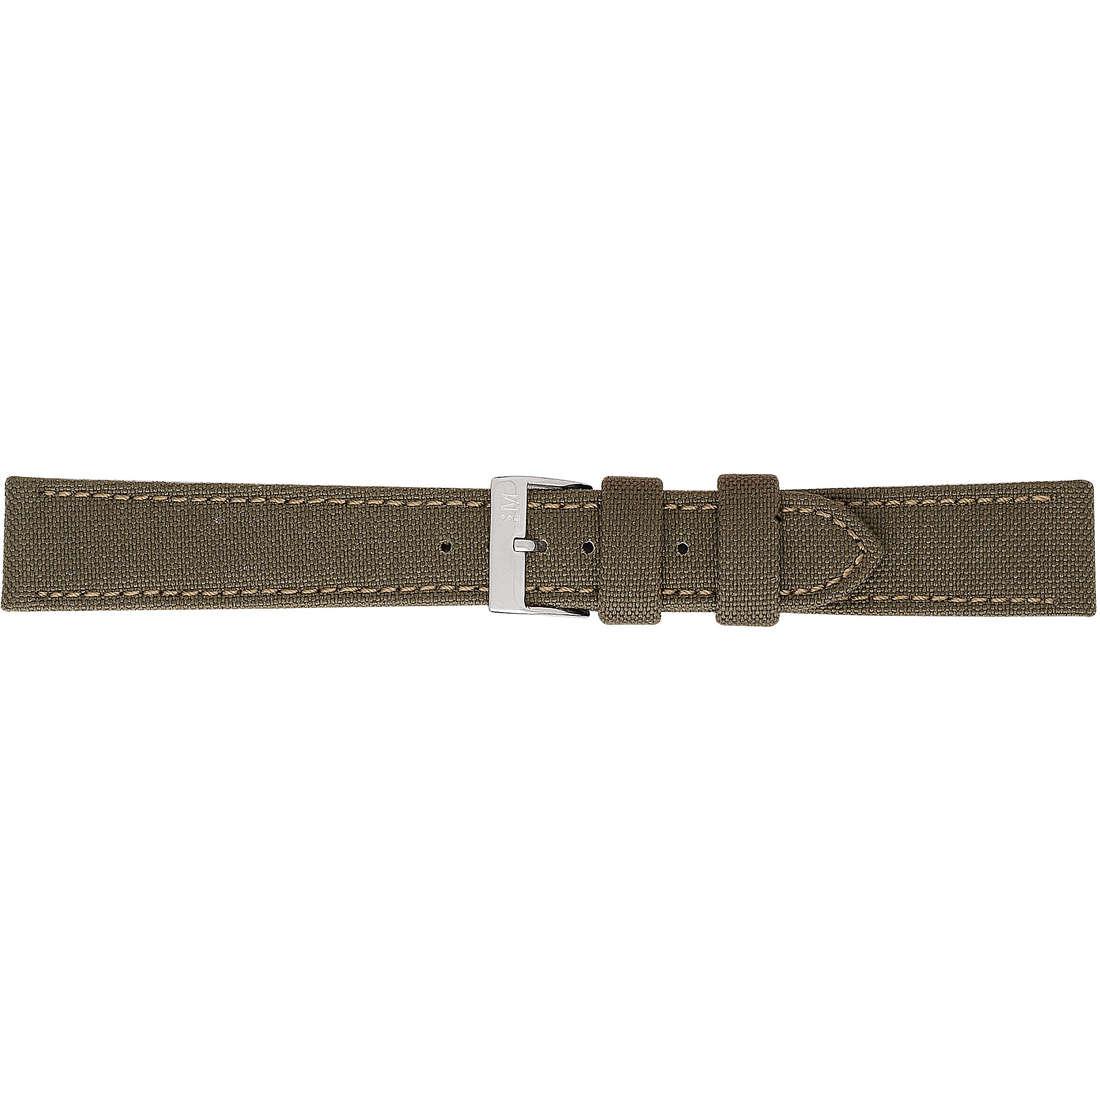 watch watch bands watch straps man Morellato Linea Sport A01U2779110072CR24